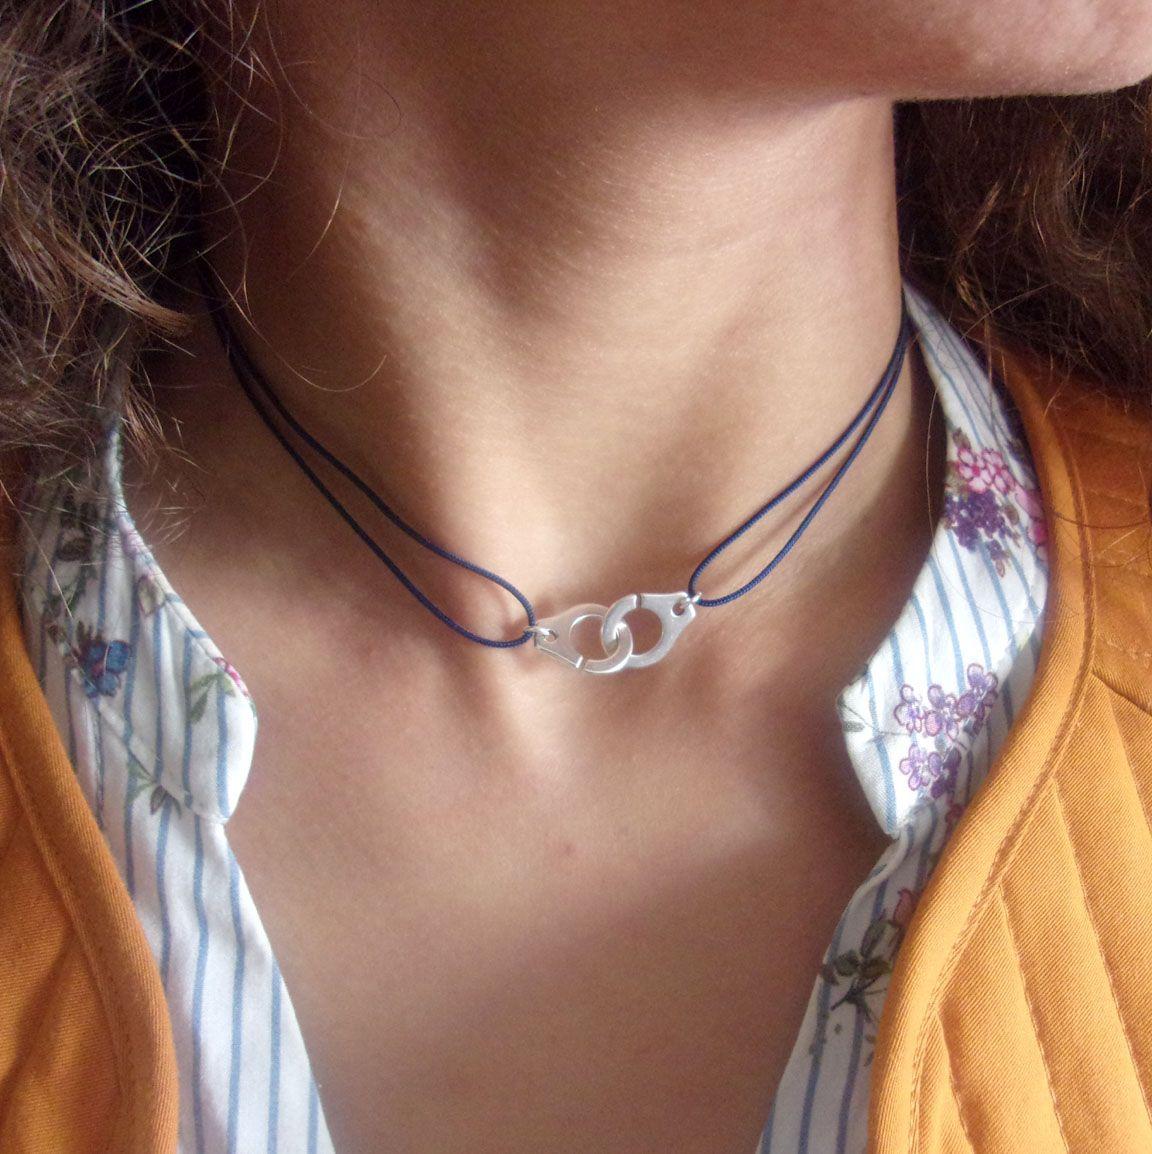 Collier minimaliste et cordon fin   Fashion bracelets, Minimalist ...